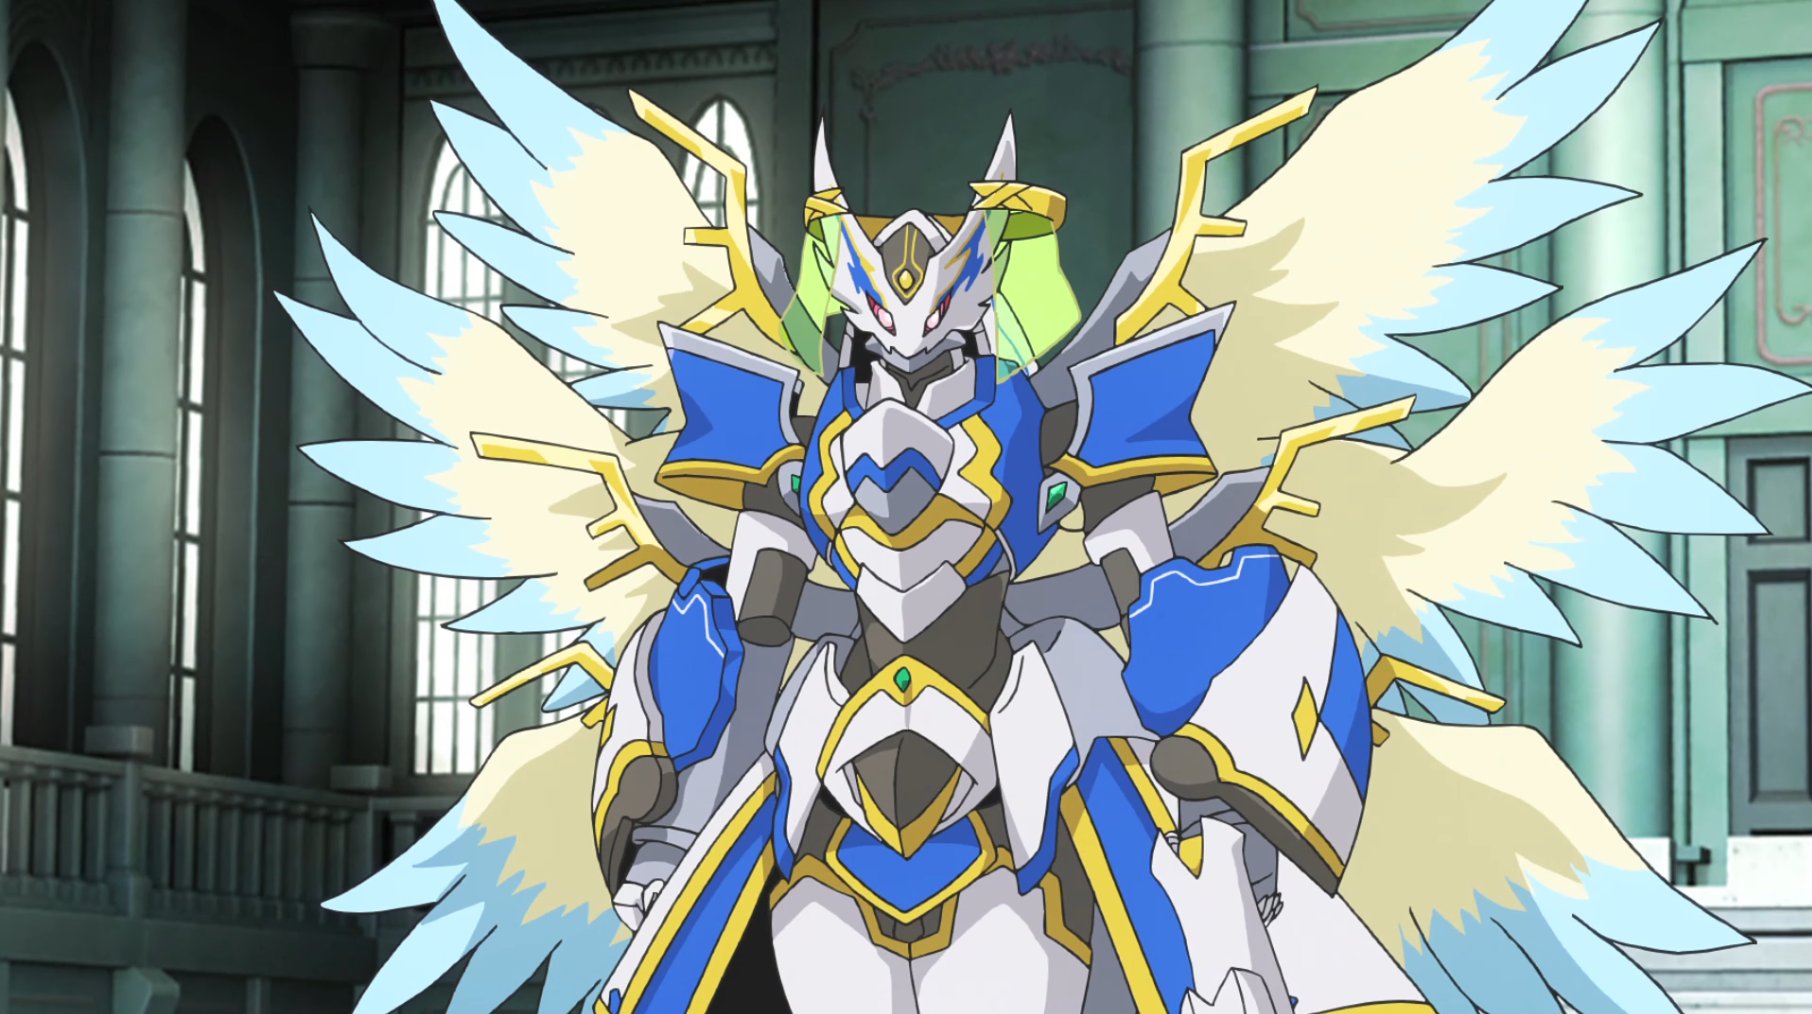 Archangel Dragon, Gavriel (character)